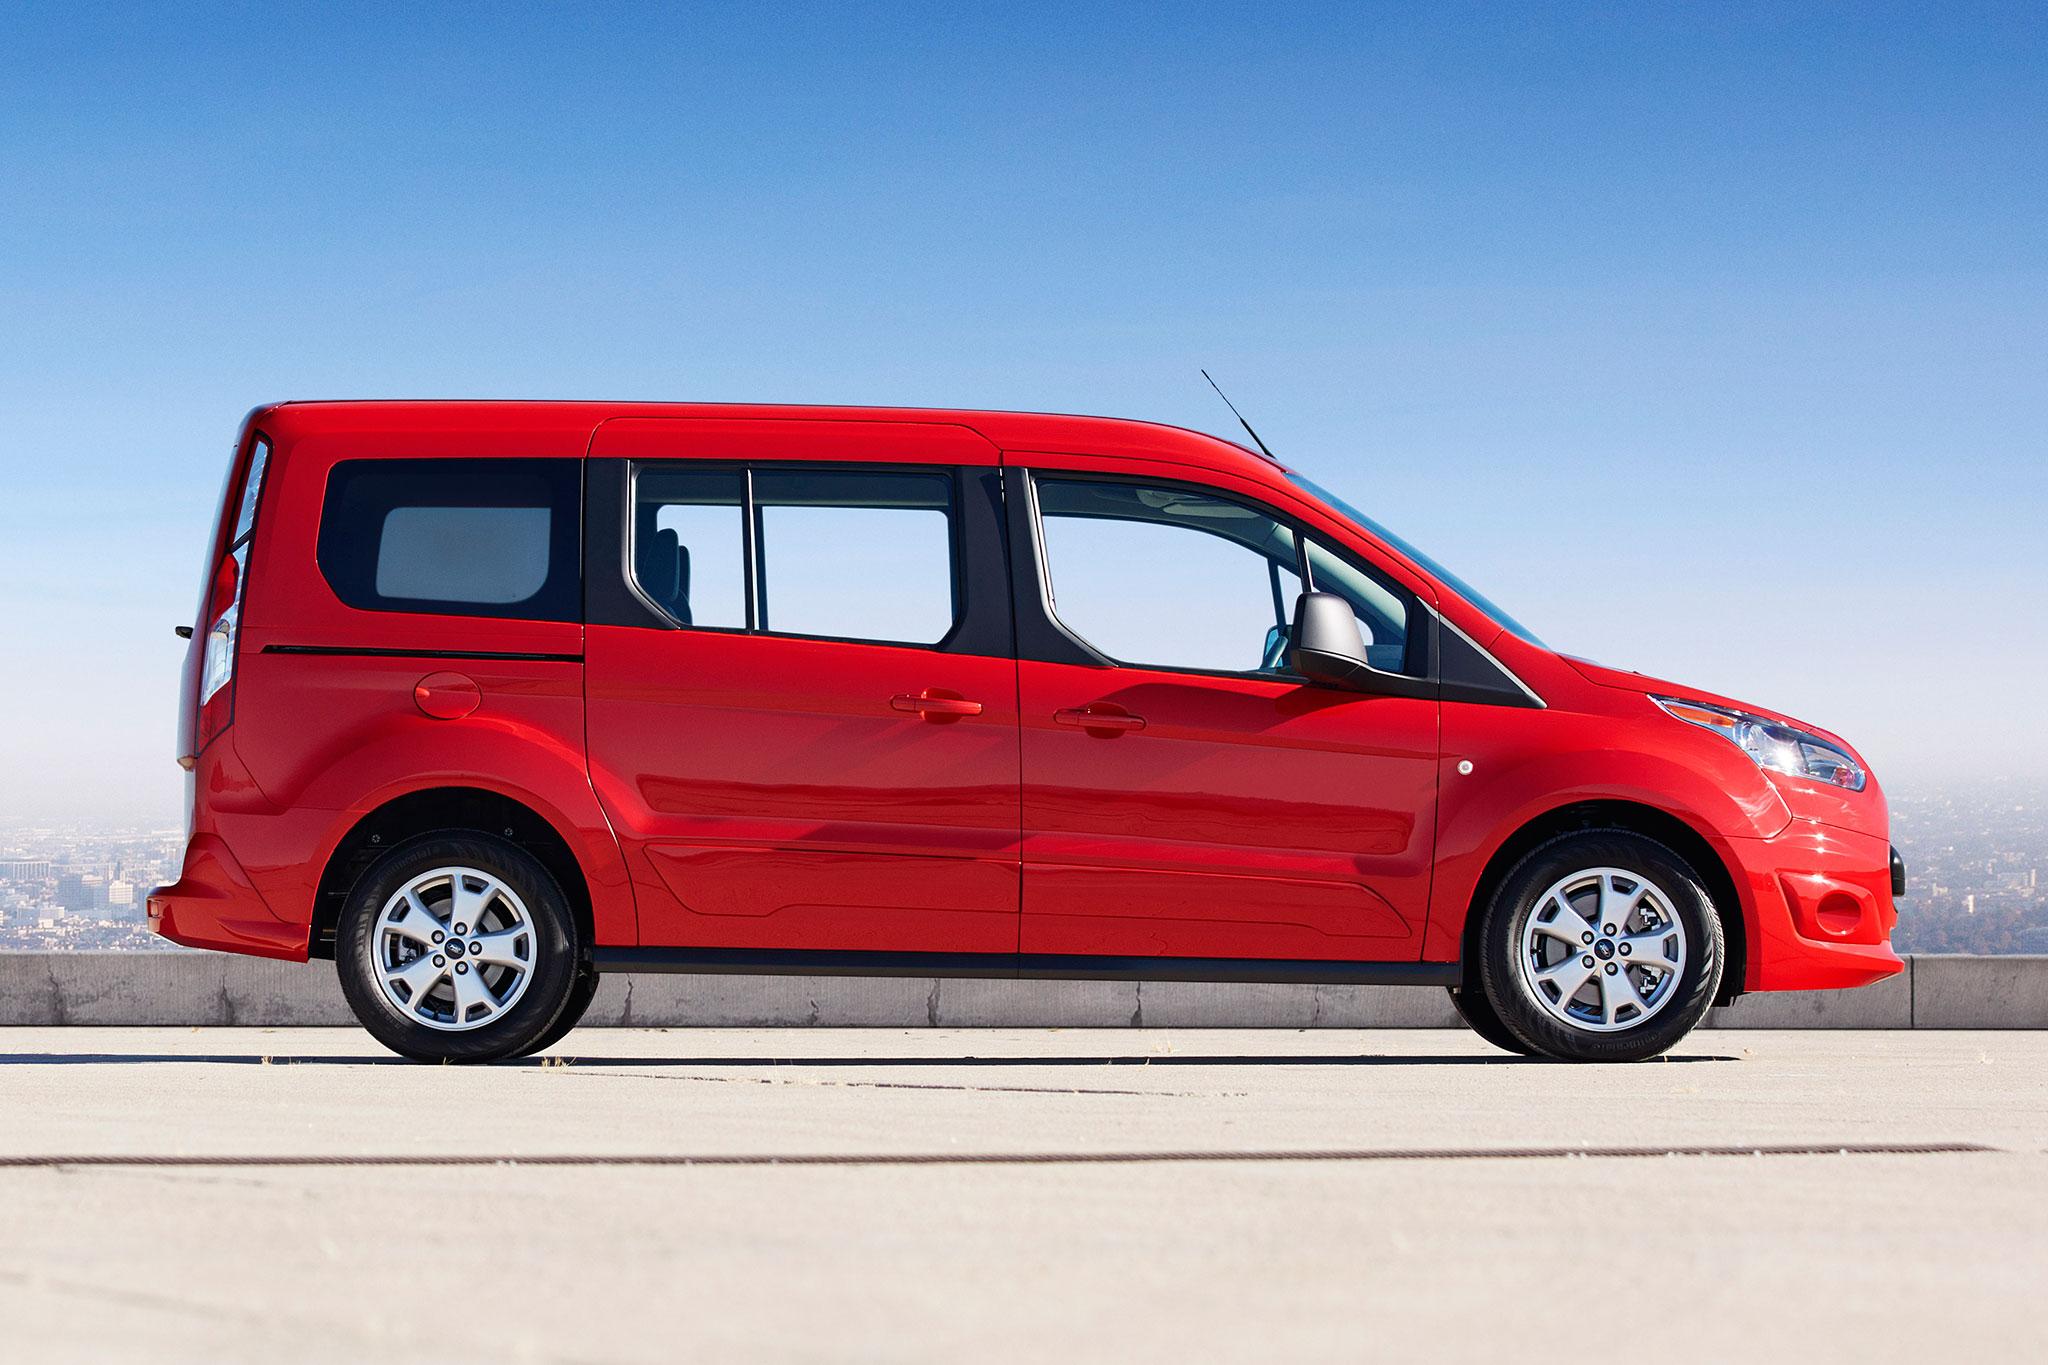 2014 ford transit connect returns up to 30 mpg automobile magazine. Black Bedroom Furniture Sets. Home Design Ideas